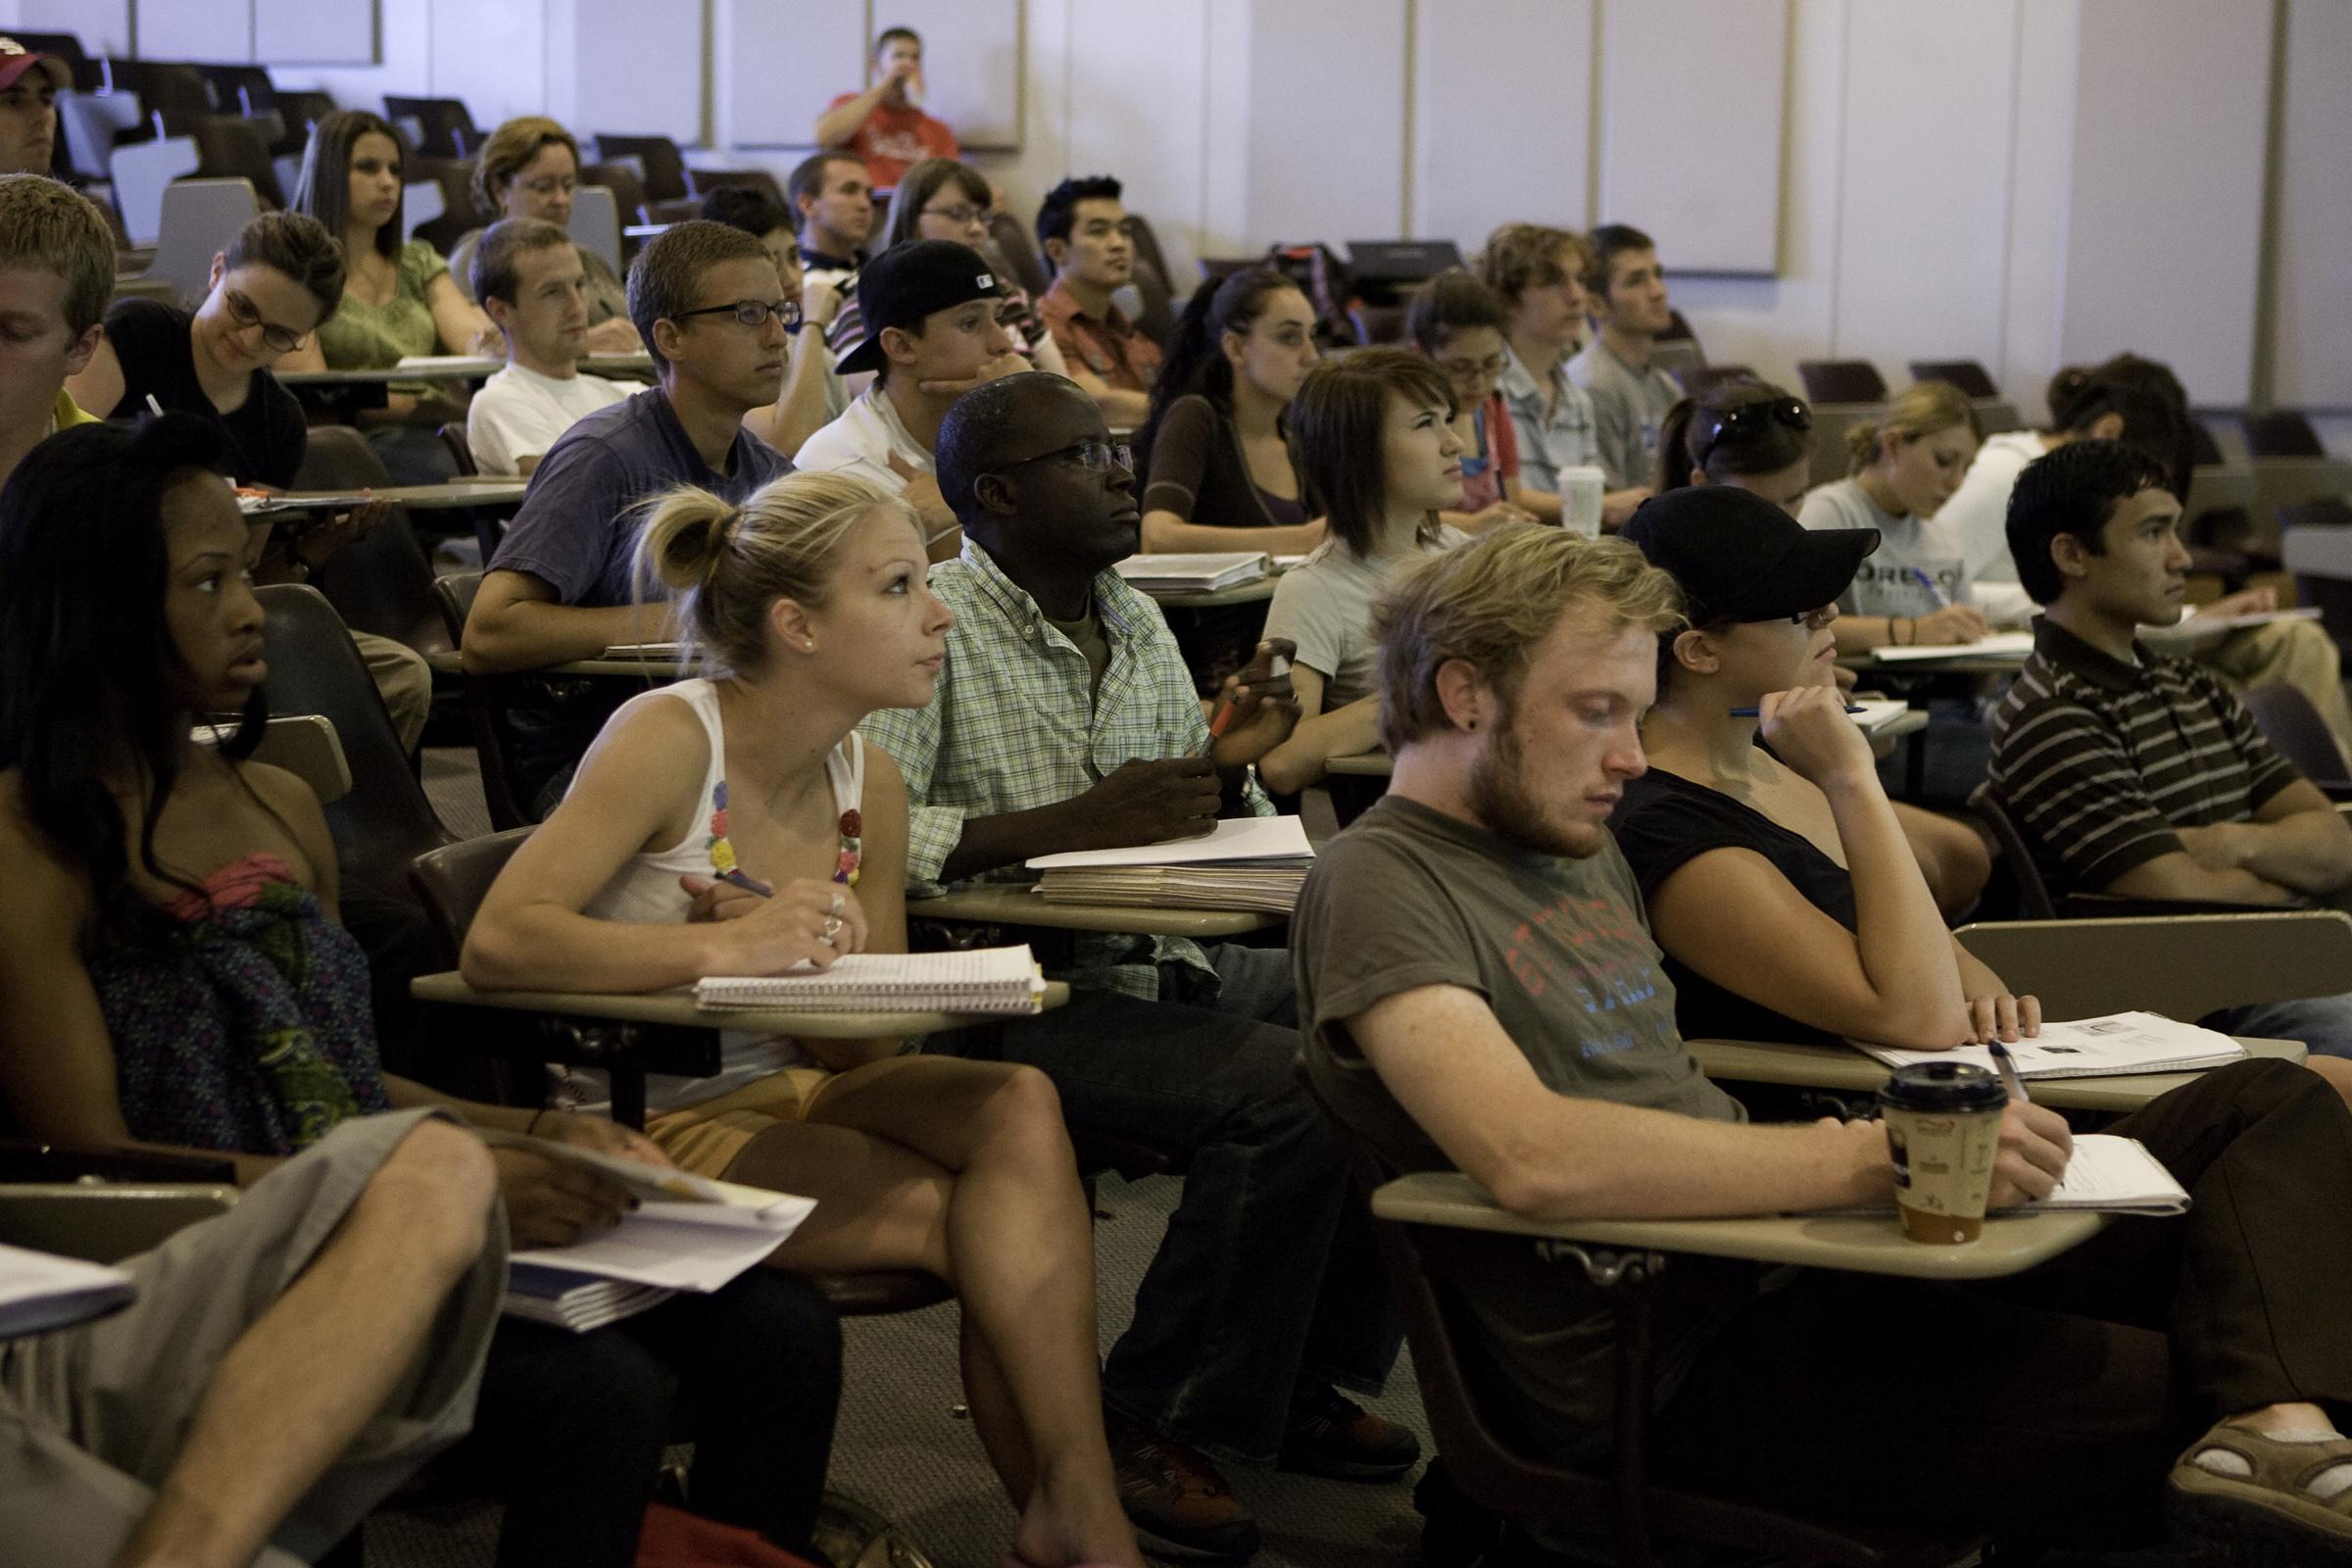 Classroom of University of Utah student.